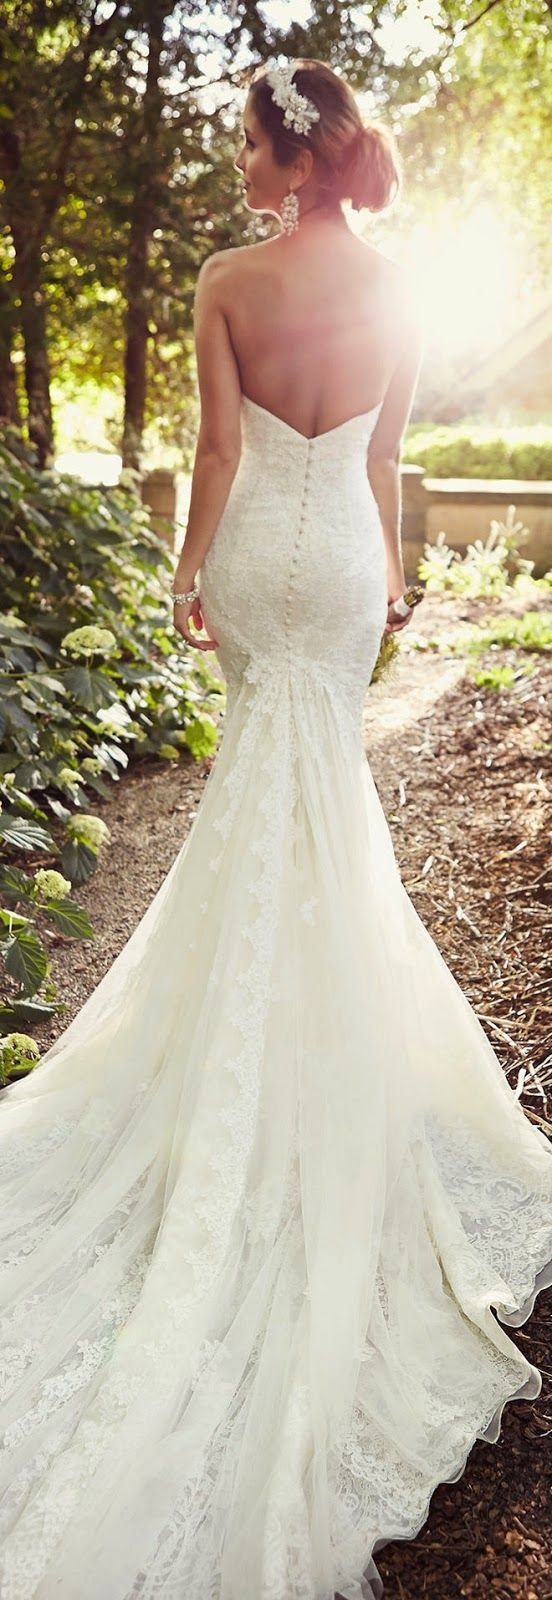 Essense of Australia Backless Lace Mermaid Wedding Dress / http://www.deerpearlflowers.com/52-perfect-low-back-wedding-dresses/